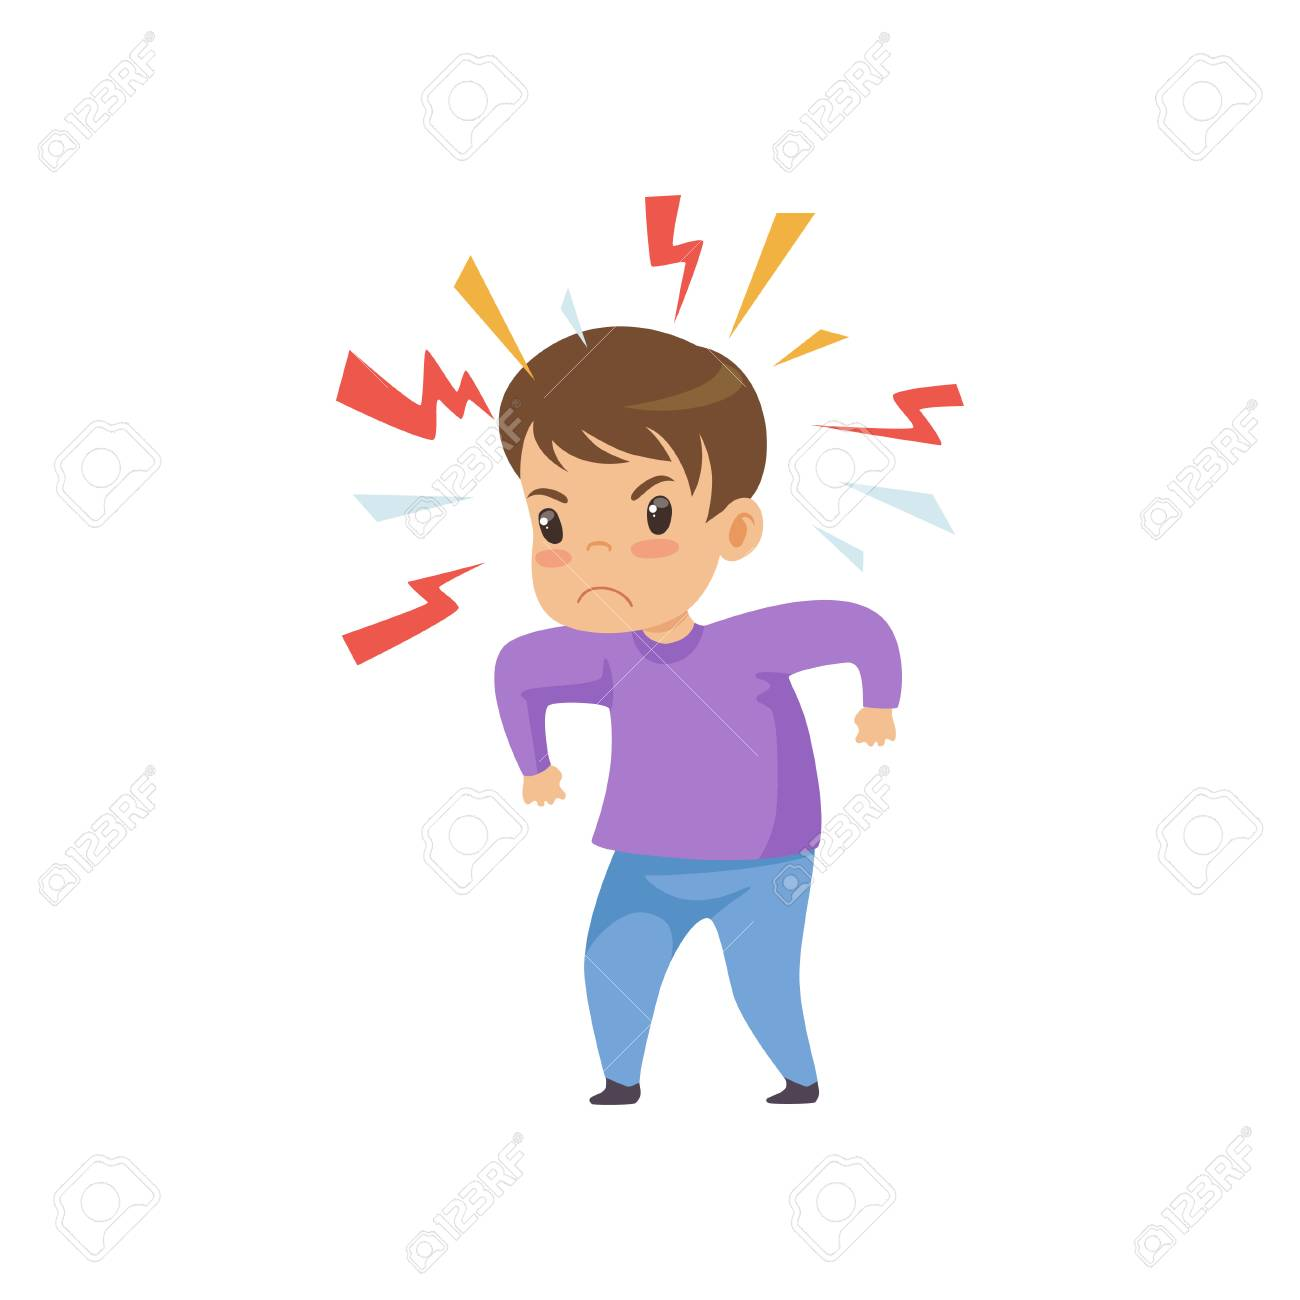 Aggressive Naughty Boy, Bad Child Behavior Vector Illustration on White Background. - 119076266